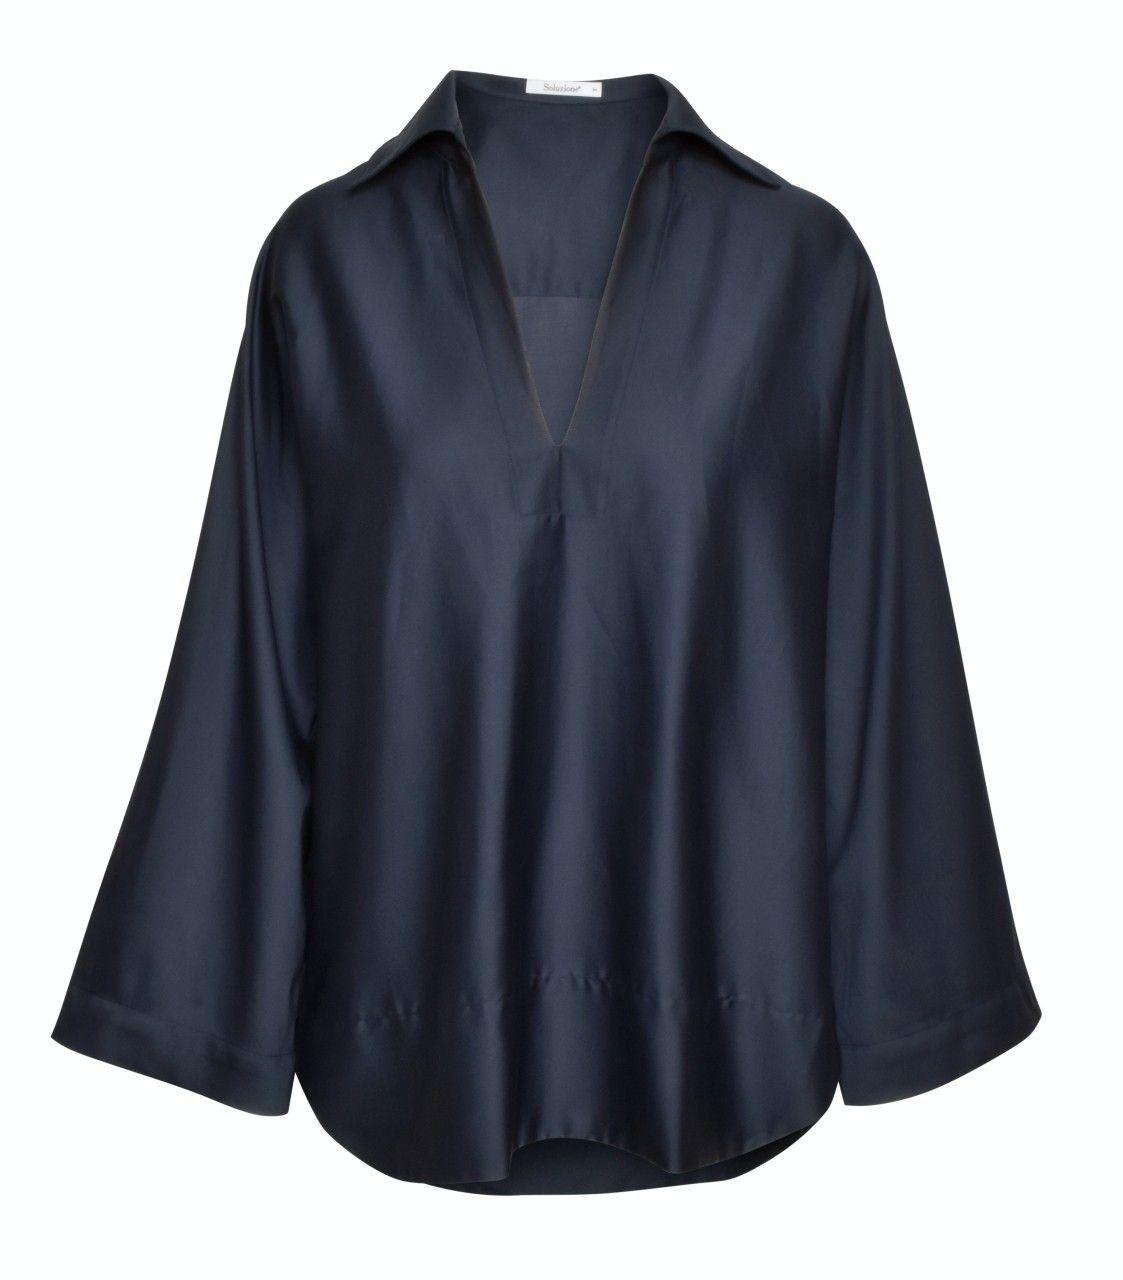 SOLUZIONE - Damen Bluse - Shirt - Marine